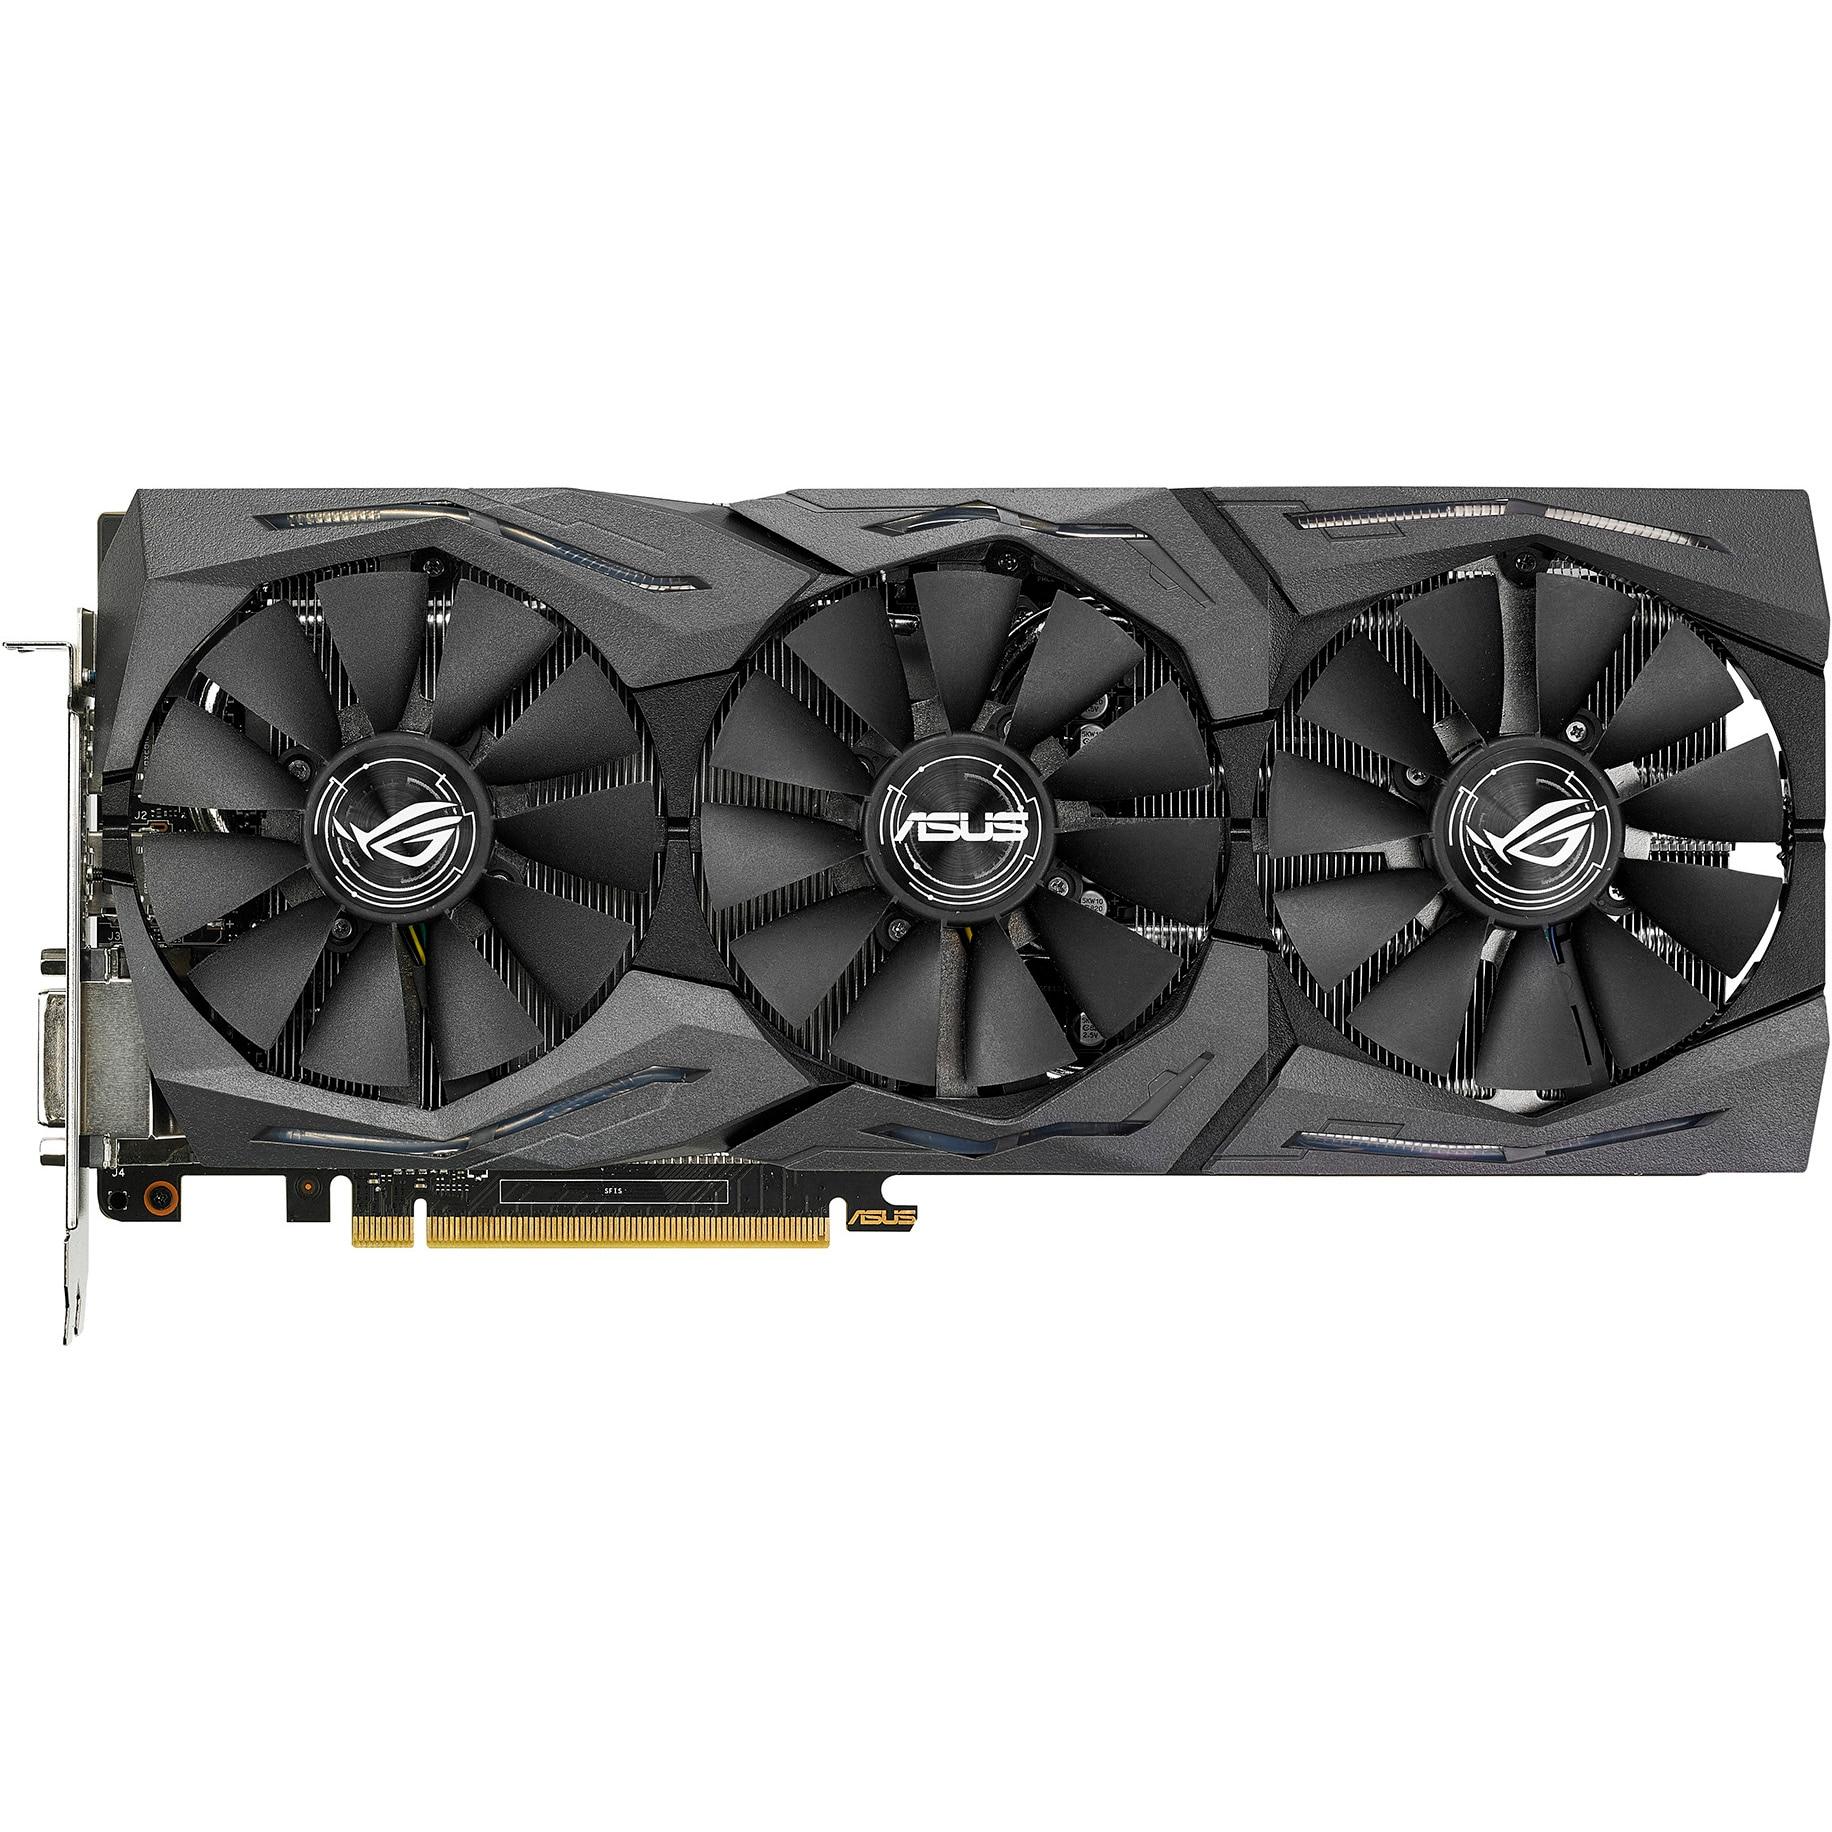 Fotografie Placa video ASUS GeForce GTX 1070 Ti STRIX GAMING A8G, 8GB DDR5, 256-bit